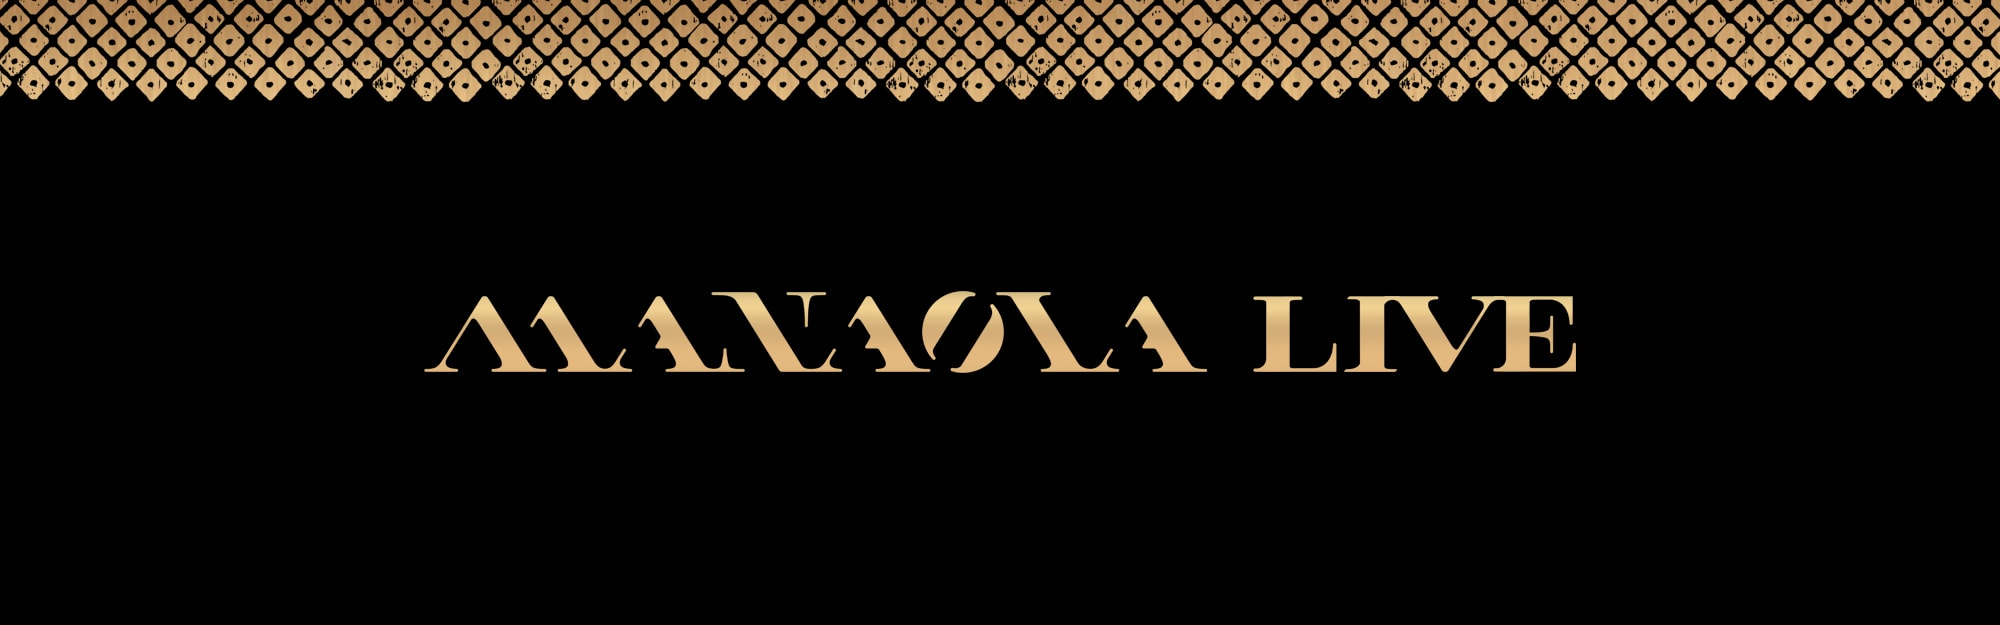 Manaola Live Banner